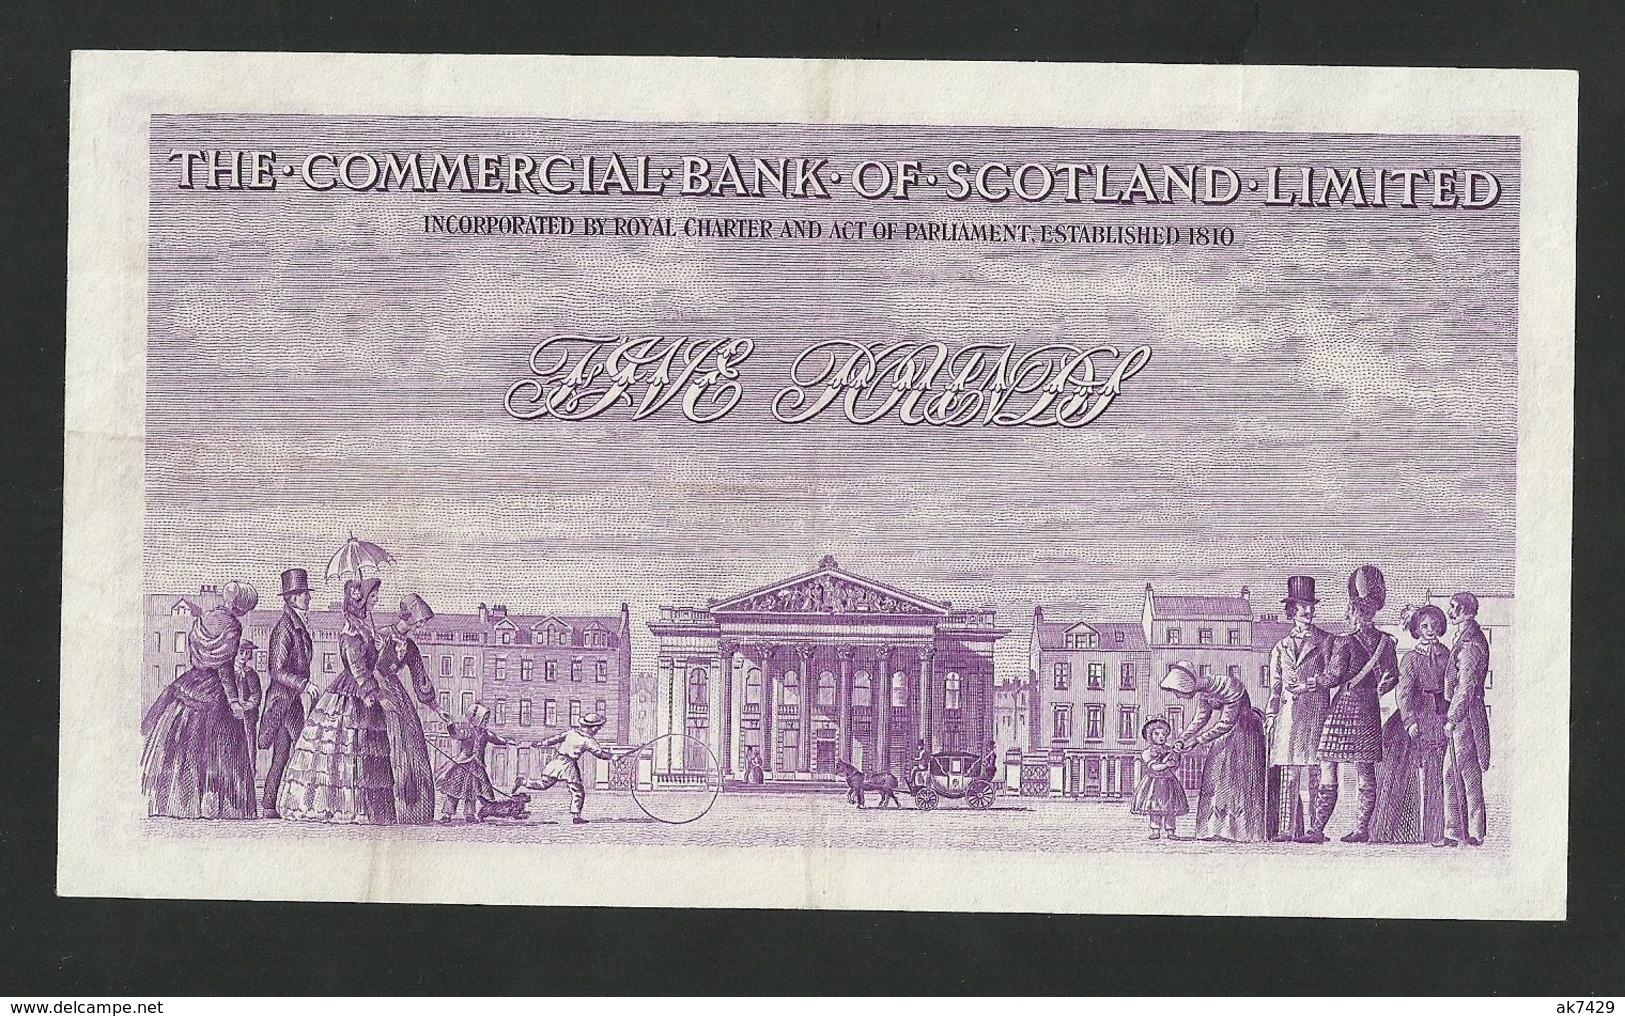 Scotland 5 Pounds 1949,Commercial Bank Of Scotland Ltd £5, P-S333 Rare Banknote - [ 3] Scotland